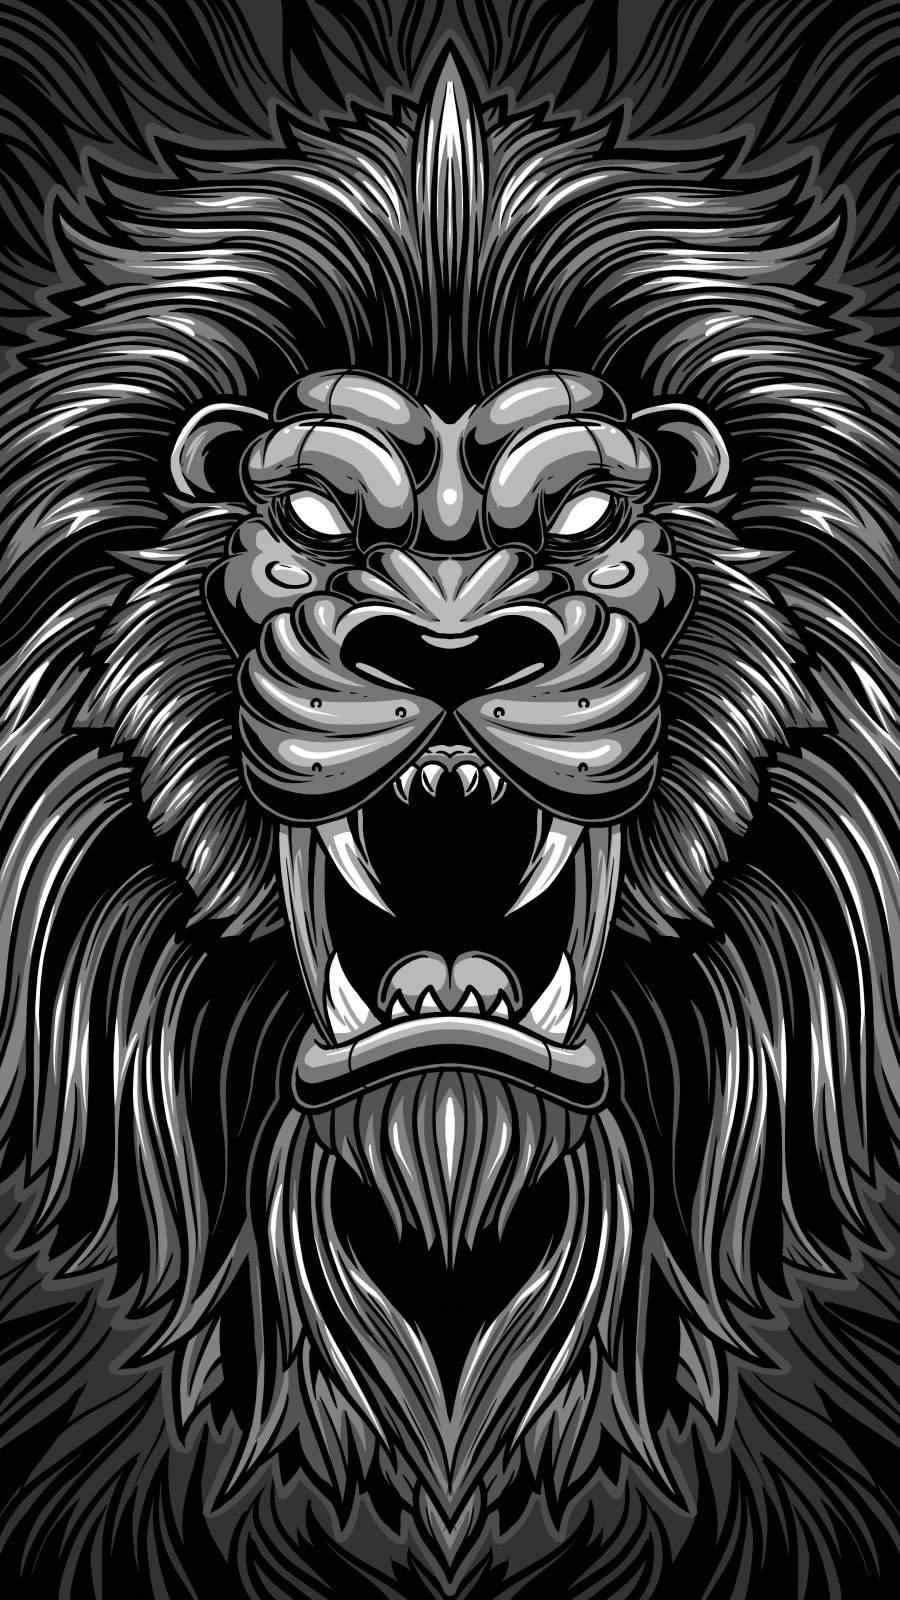 Lion King Digital Art iPhone Wallpaper